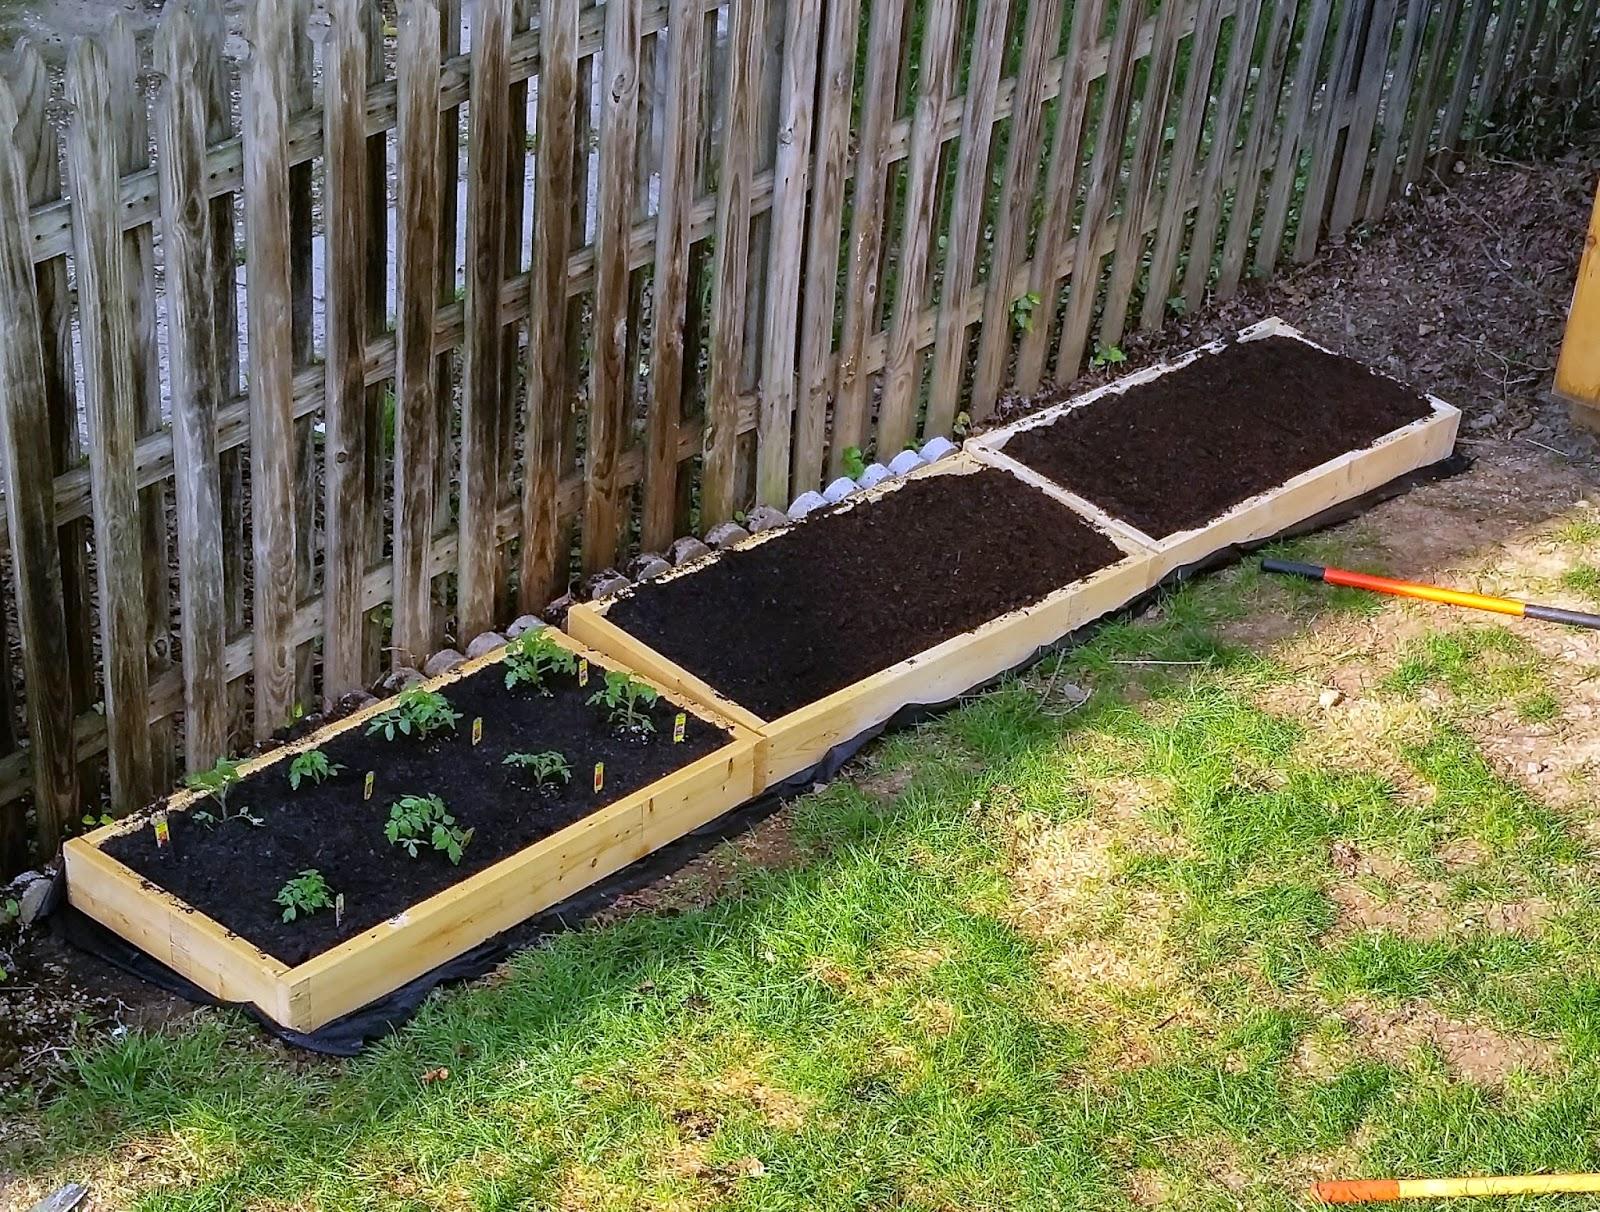 Ben 39 S Journal Gardening Progress Raised Beds Filled X Garden Trampled And Will It Grow